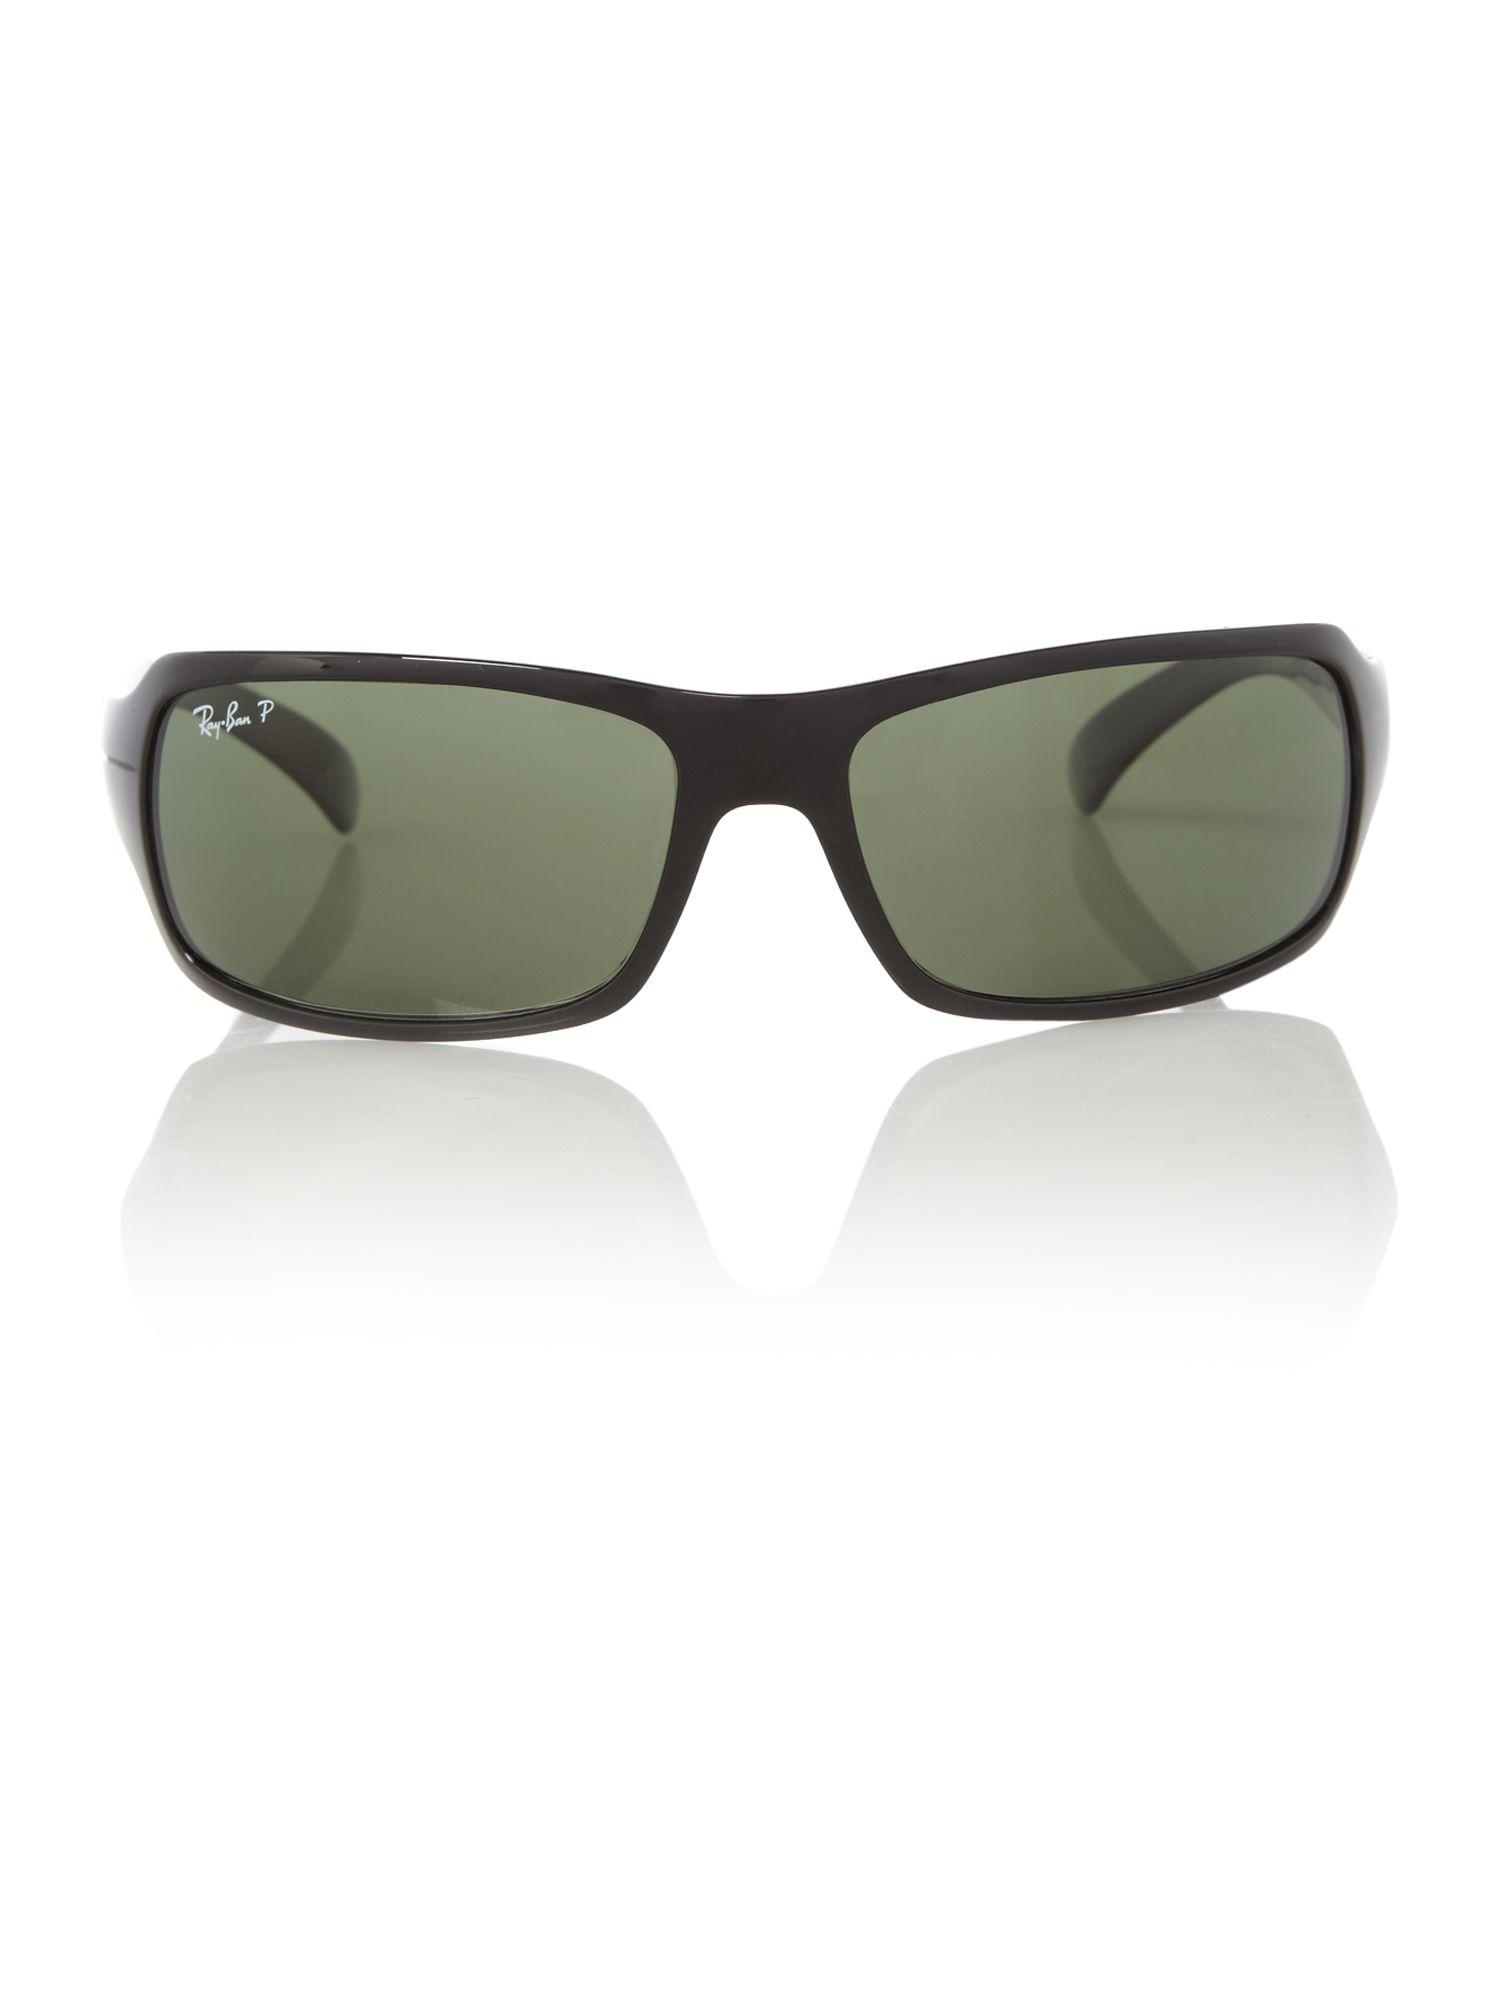 ray ban mens sunglasses rb3478  ray ban mens sunglasses rb3478